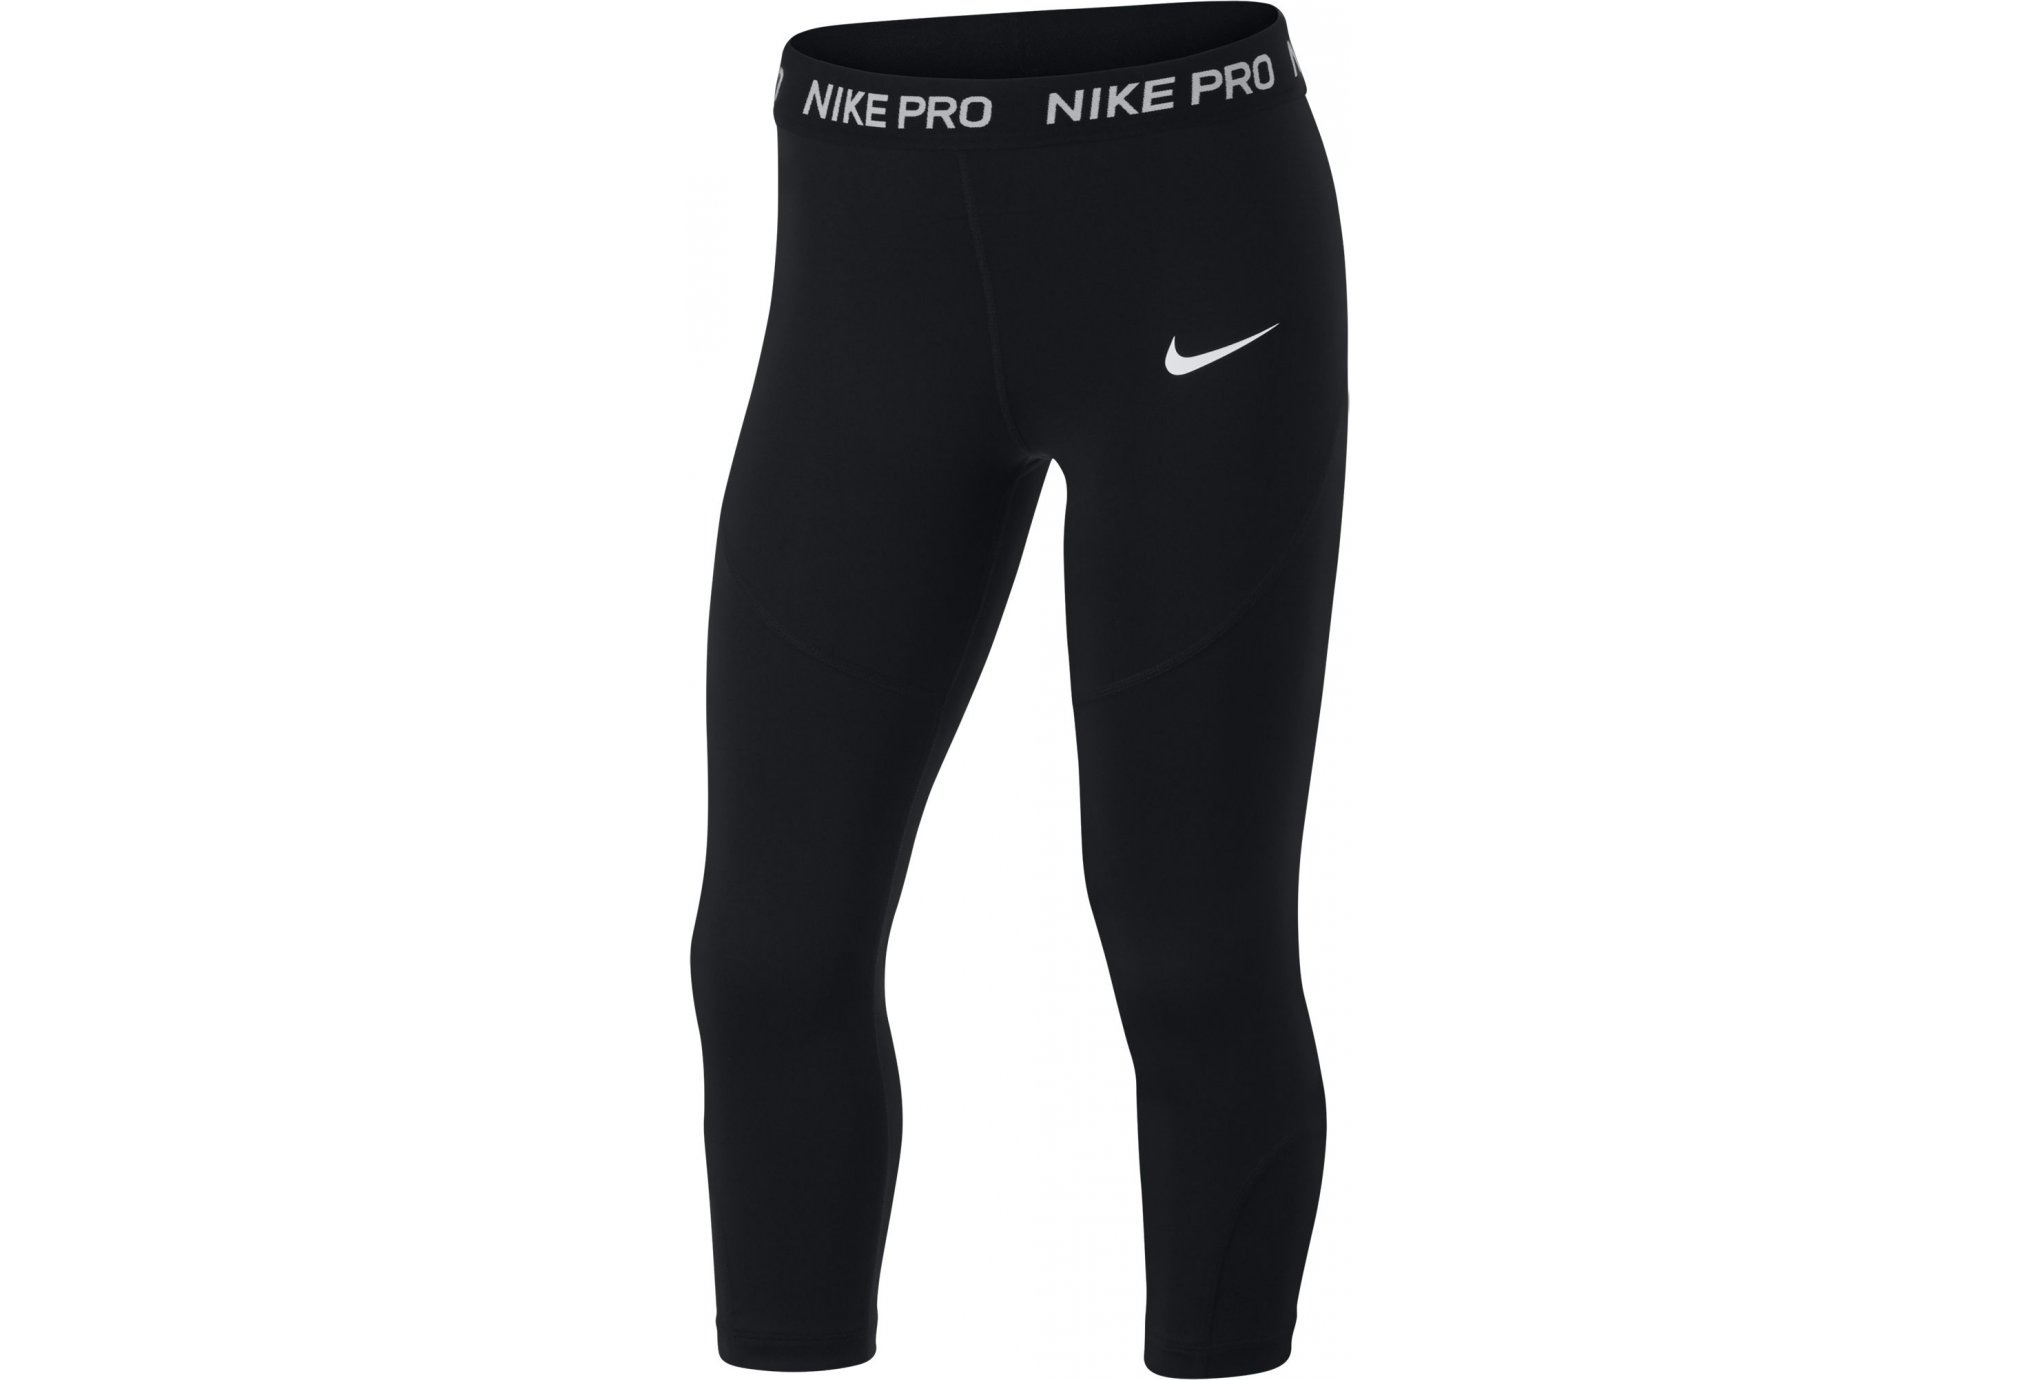 Nike mallas 3/4 Pro vêtement running femme